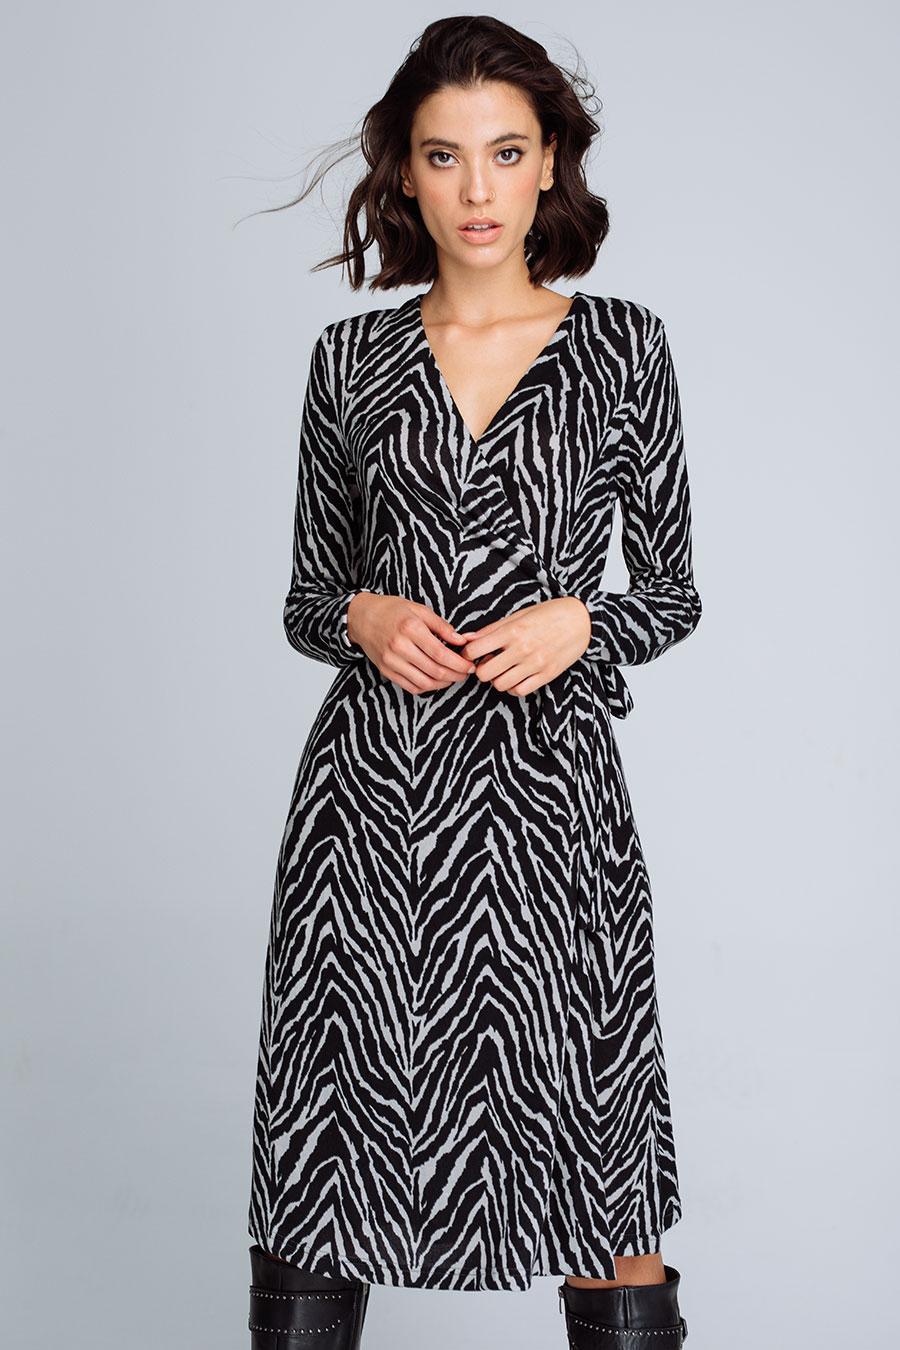 Online Shop Jagger Brand Zenska Haljina Jg 5480 01 05 Jesen Zima 2020 2021 02